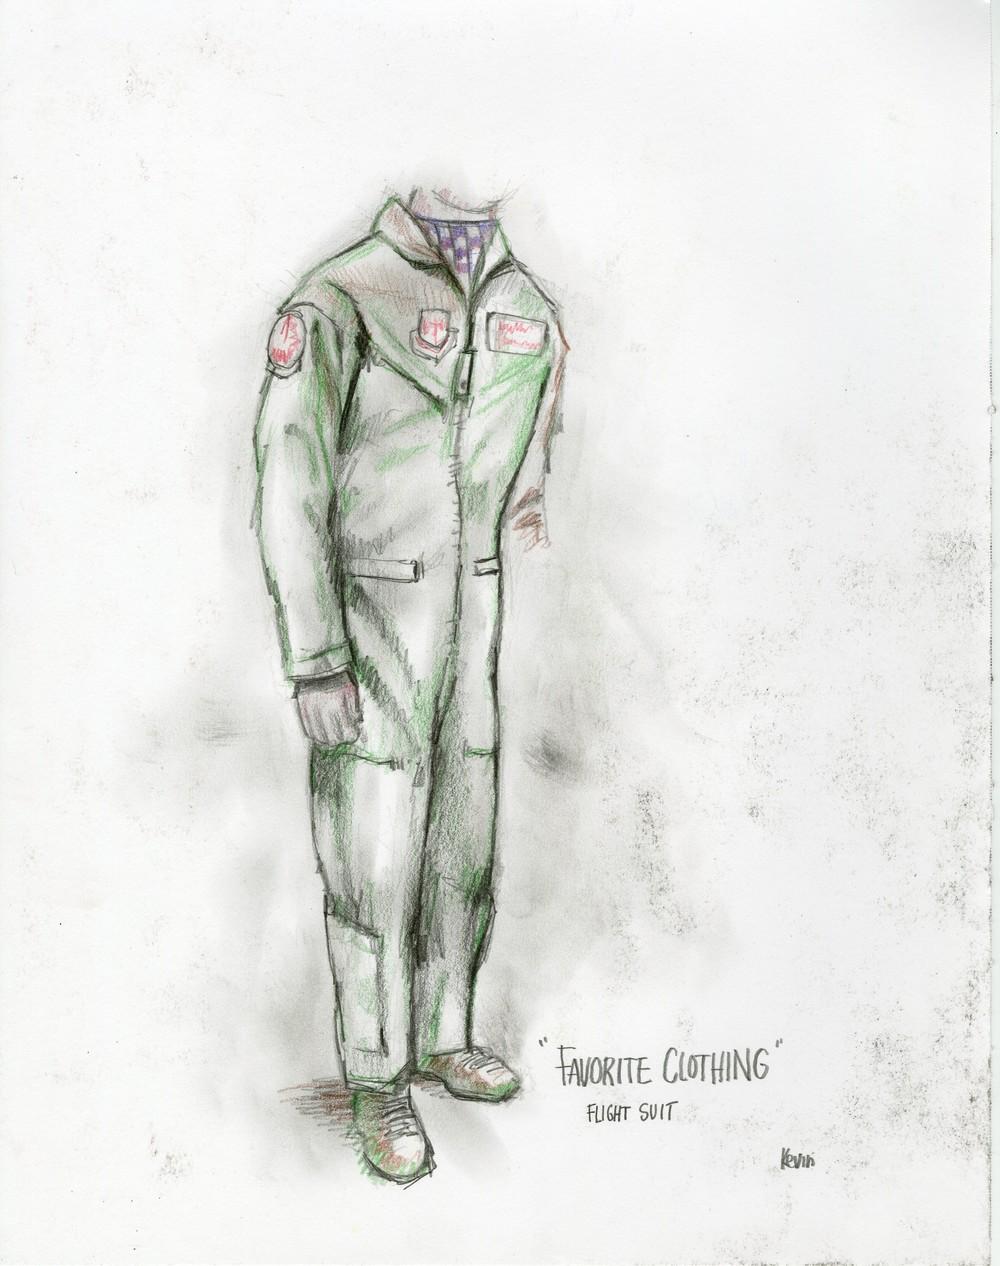 Kevin L. - Favorite Clothing